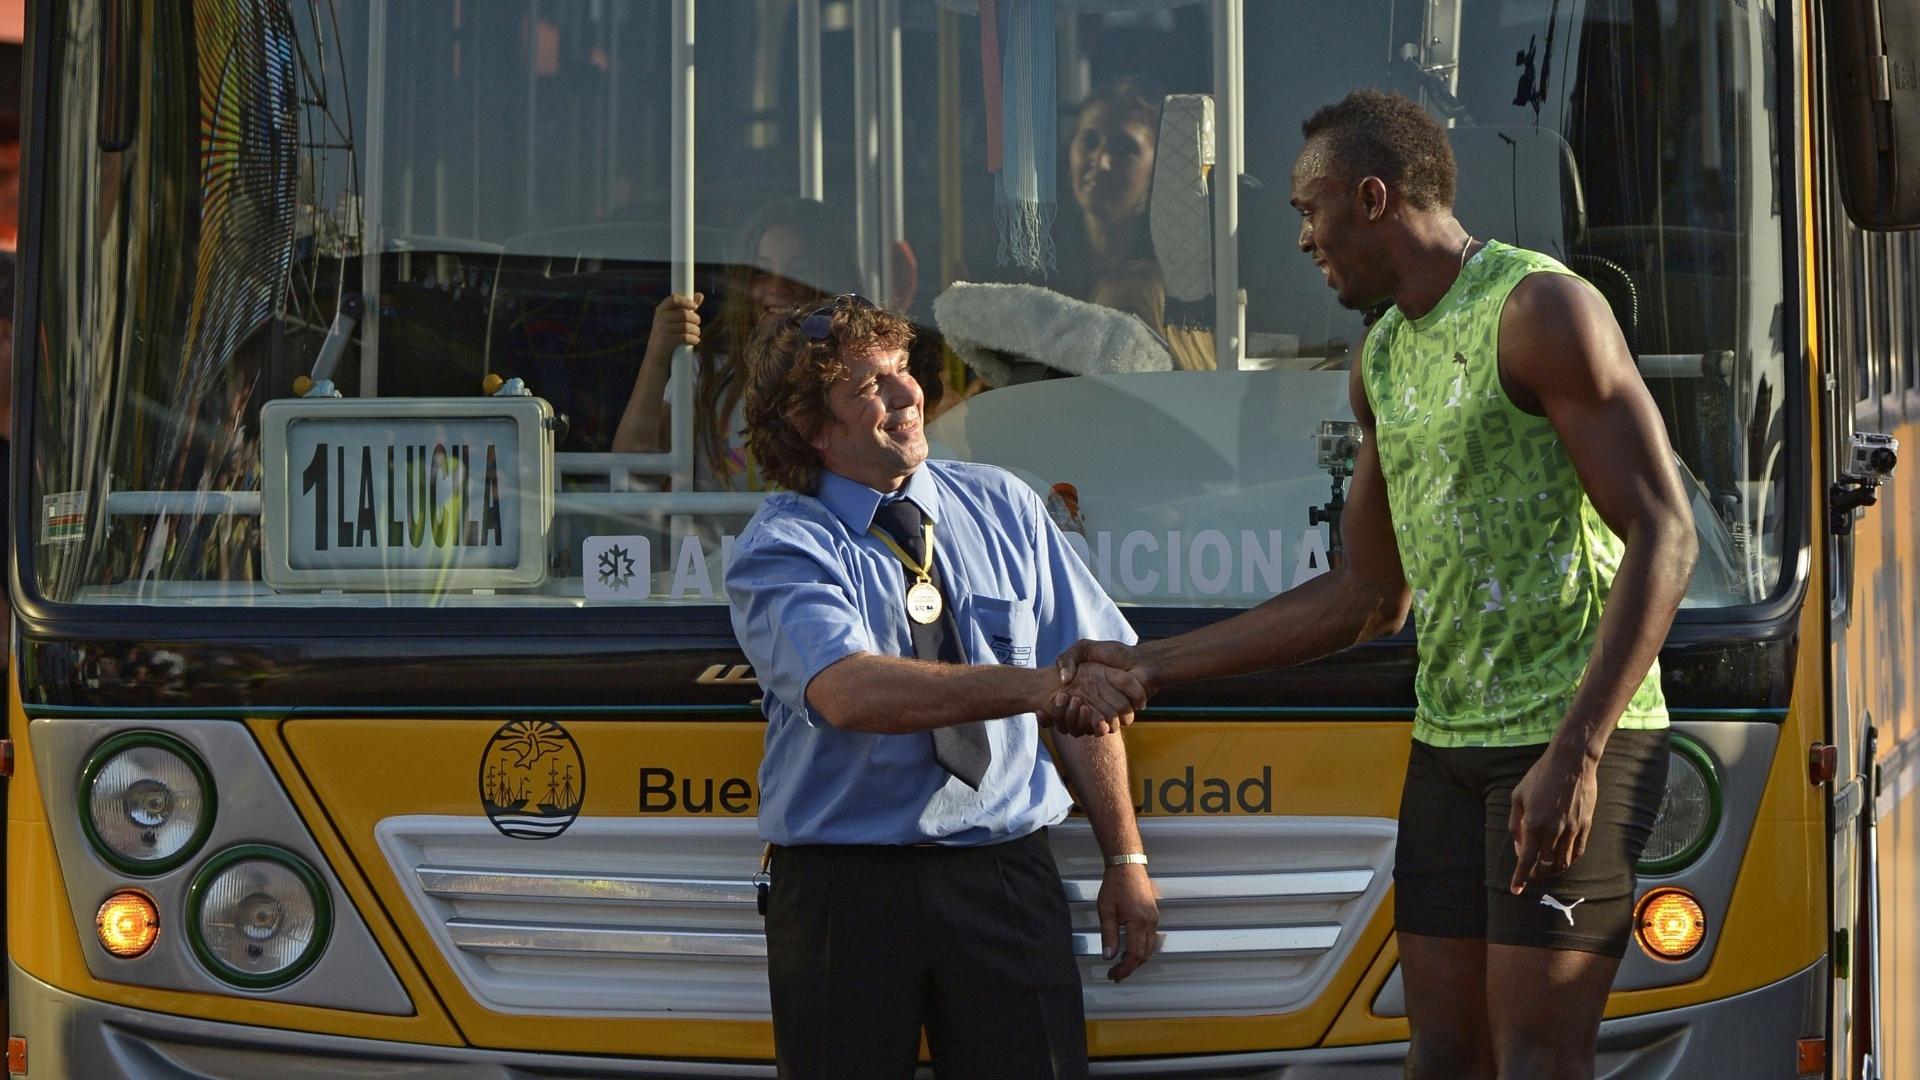 14.dez.2013 - Bolt cumprimenta motorista do ônibus que venceu em desafio na Argentina